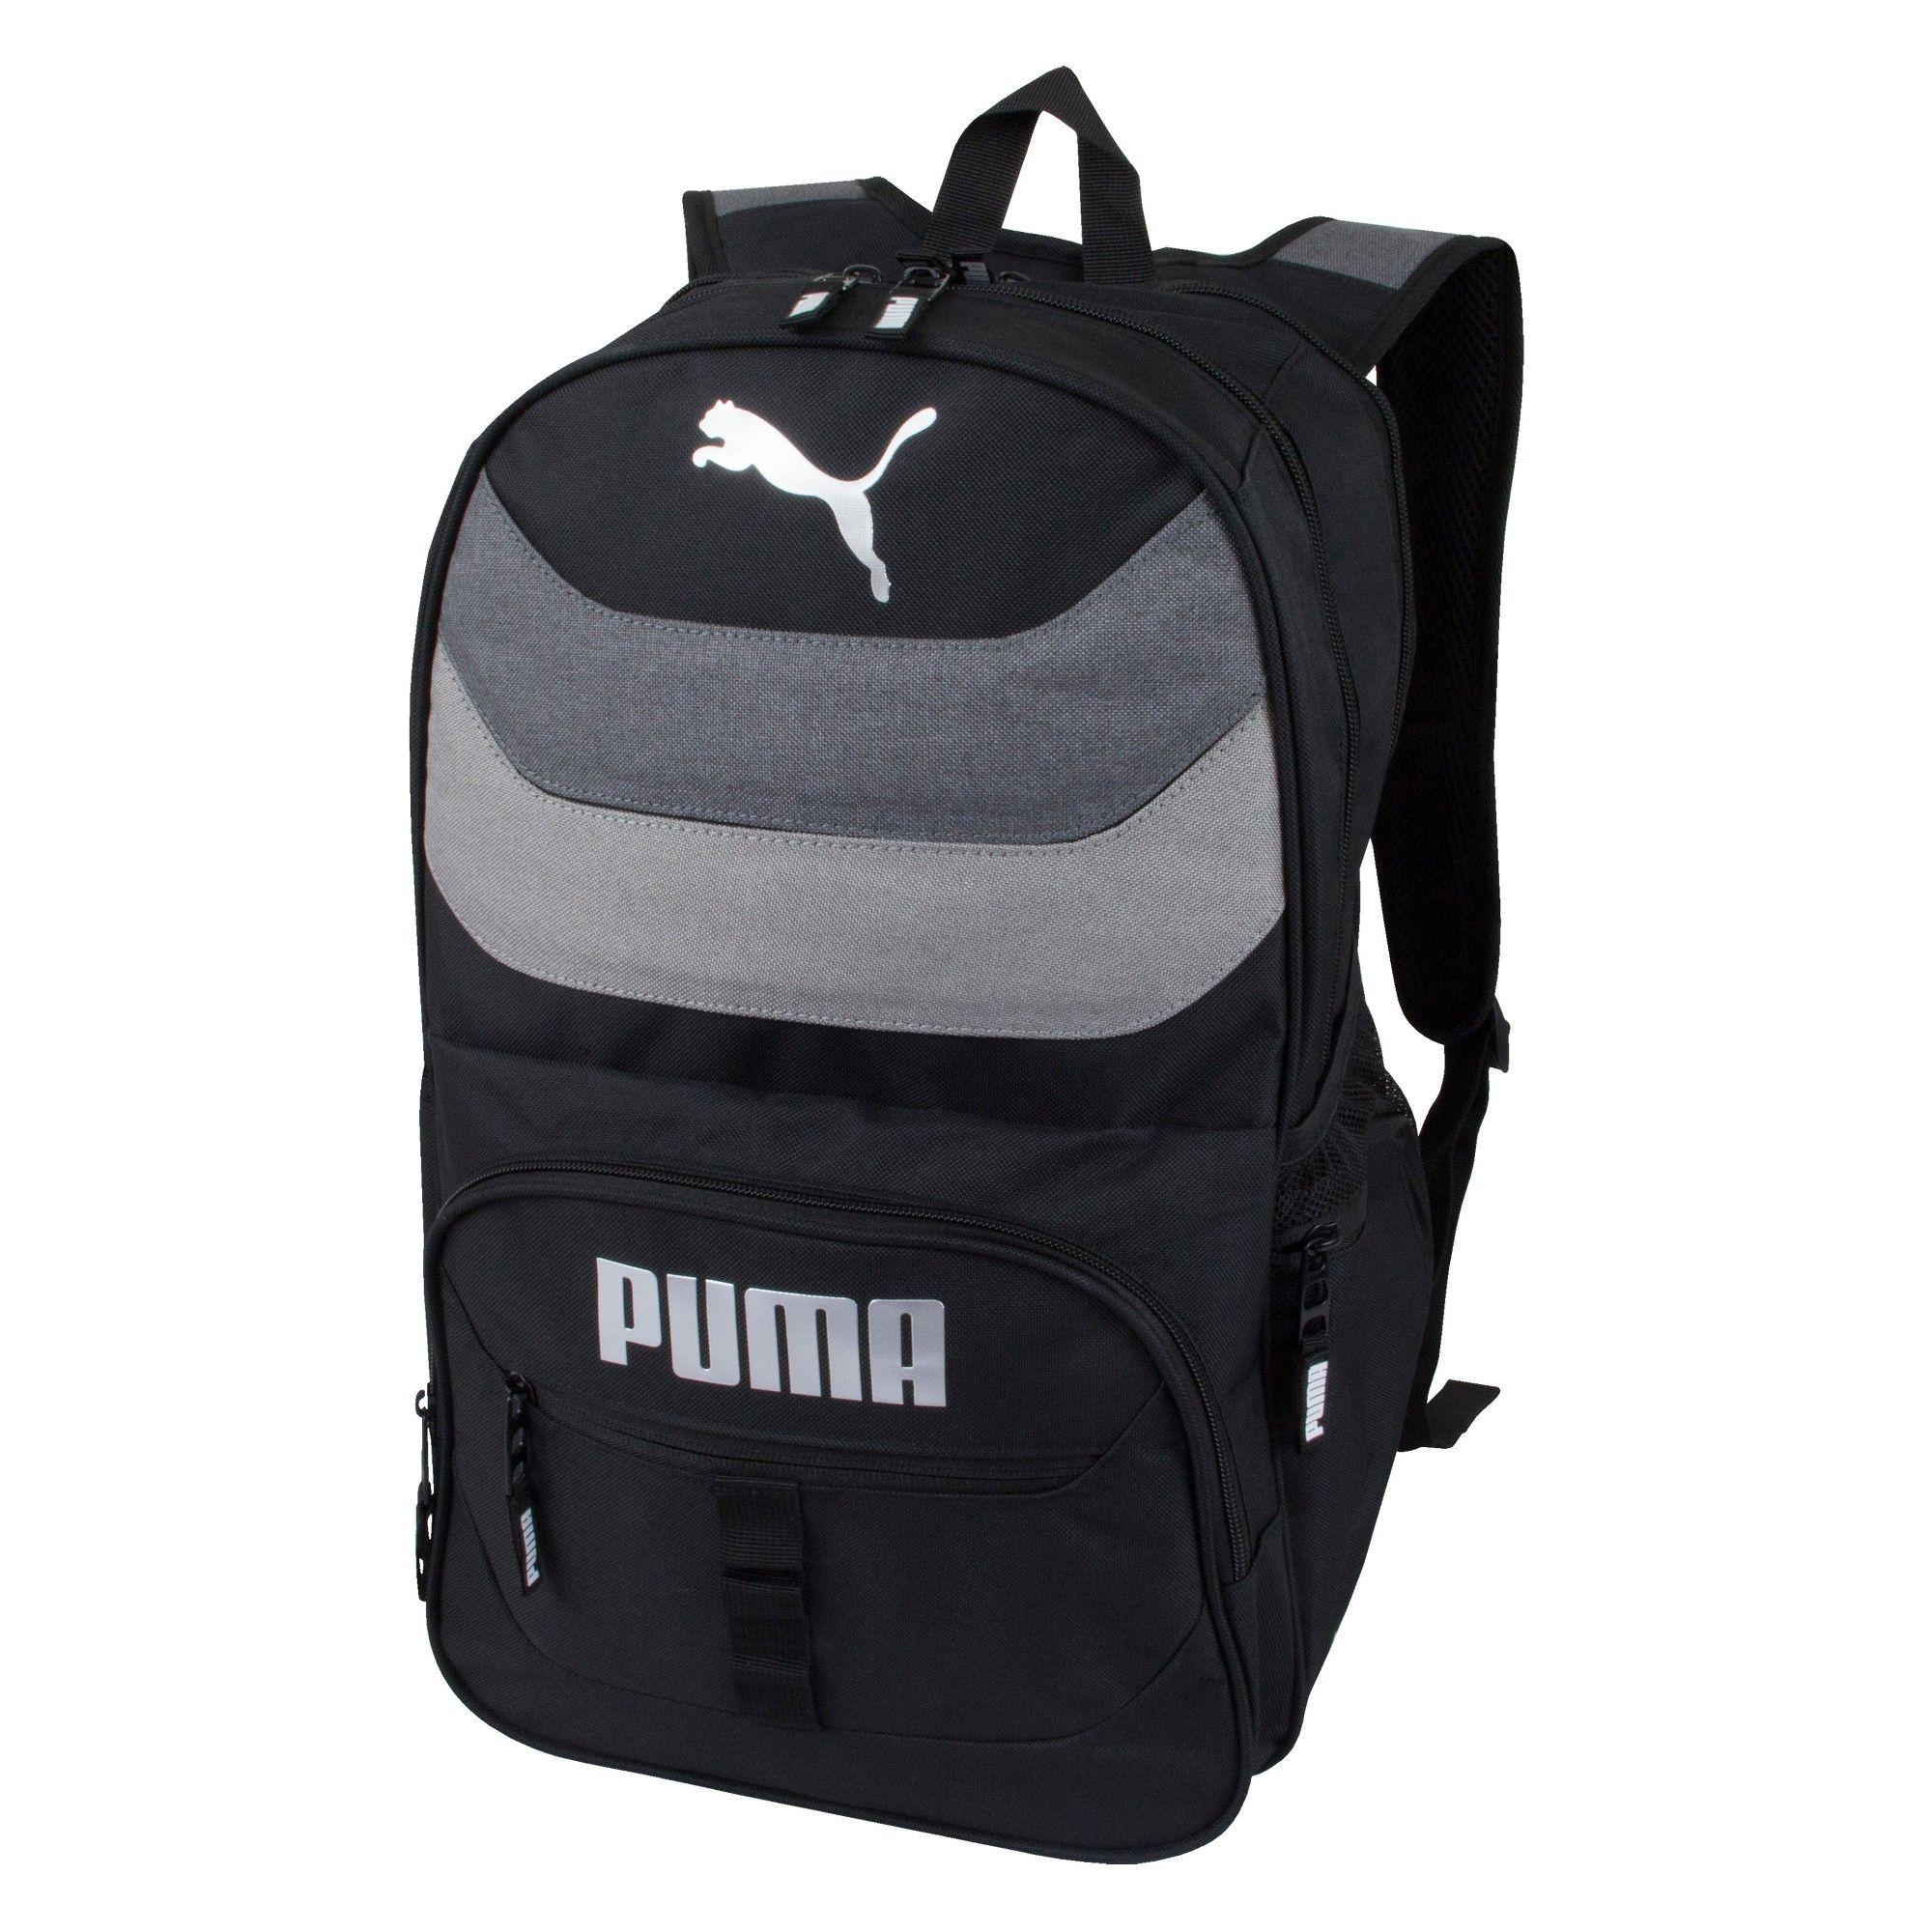 Puma 19.5 Quilt Stripe Backpack - Black   Products   Pinterest ... 669ffe84f6